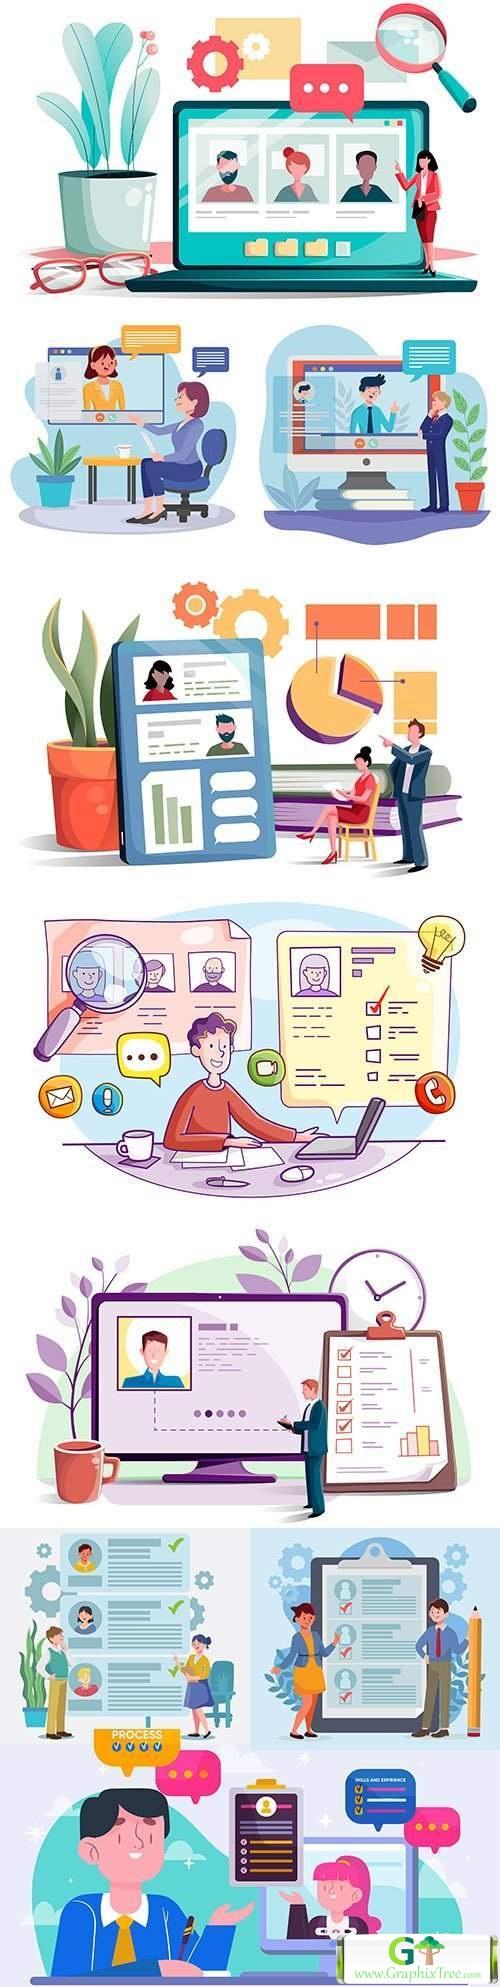 Online interview and hiring flat design illustration